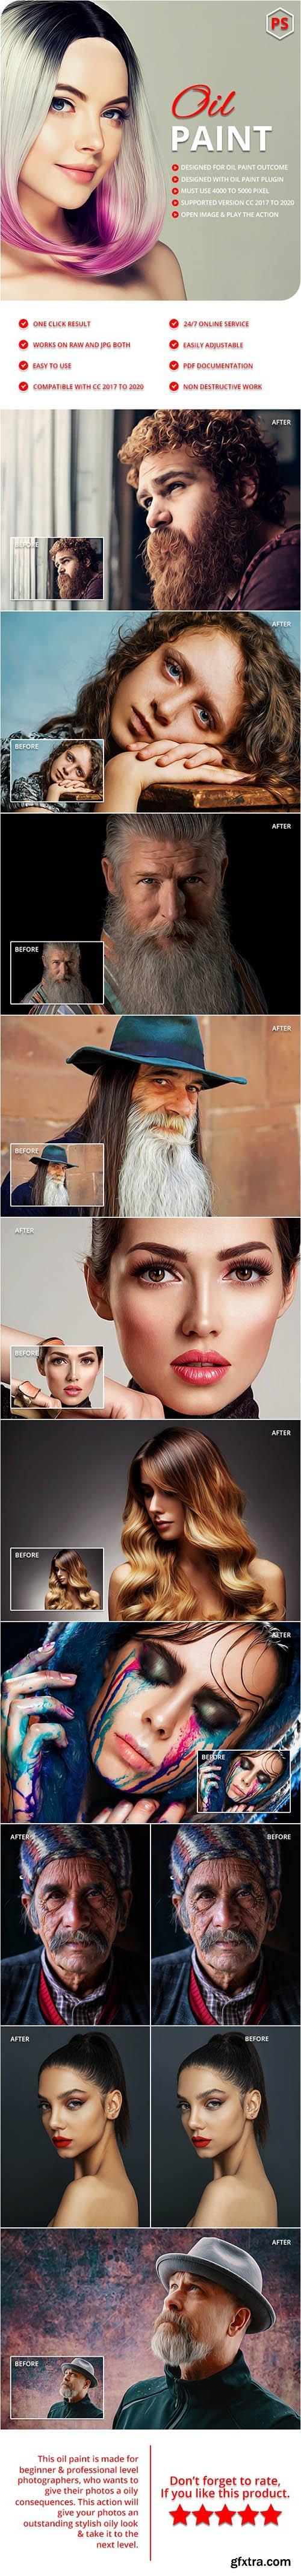 GraphicRiver - Oil Art Photoshop Action 28917188